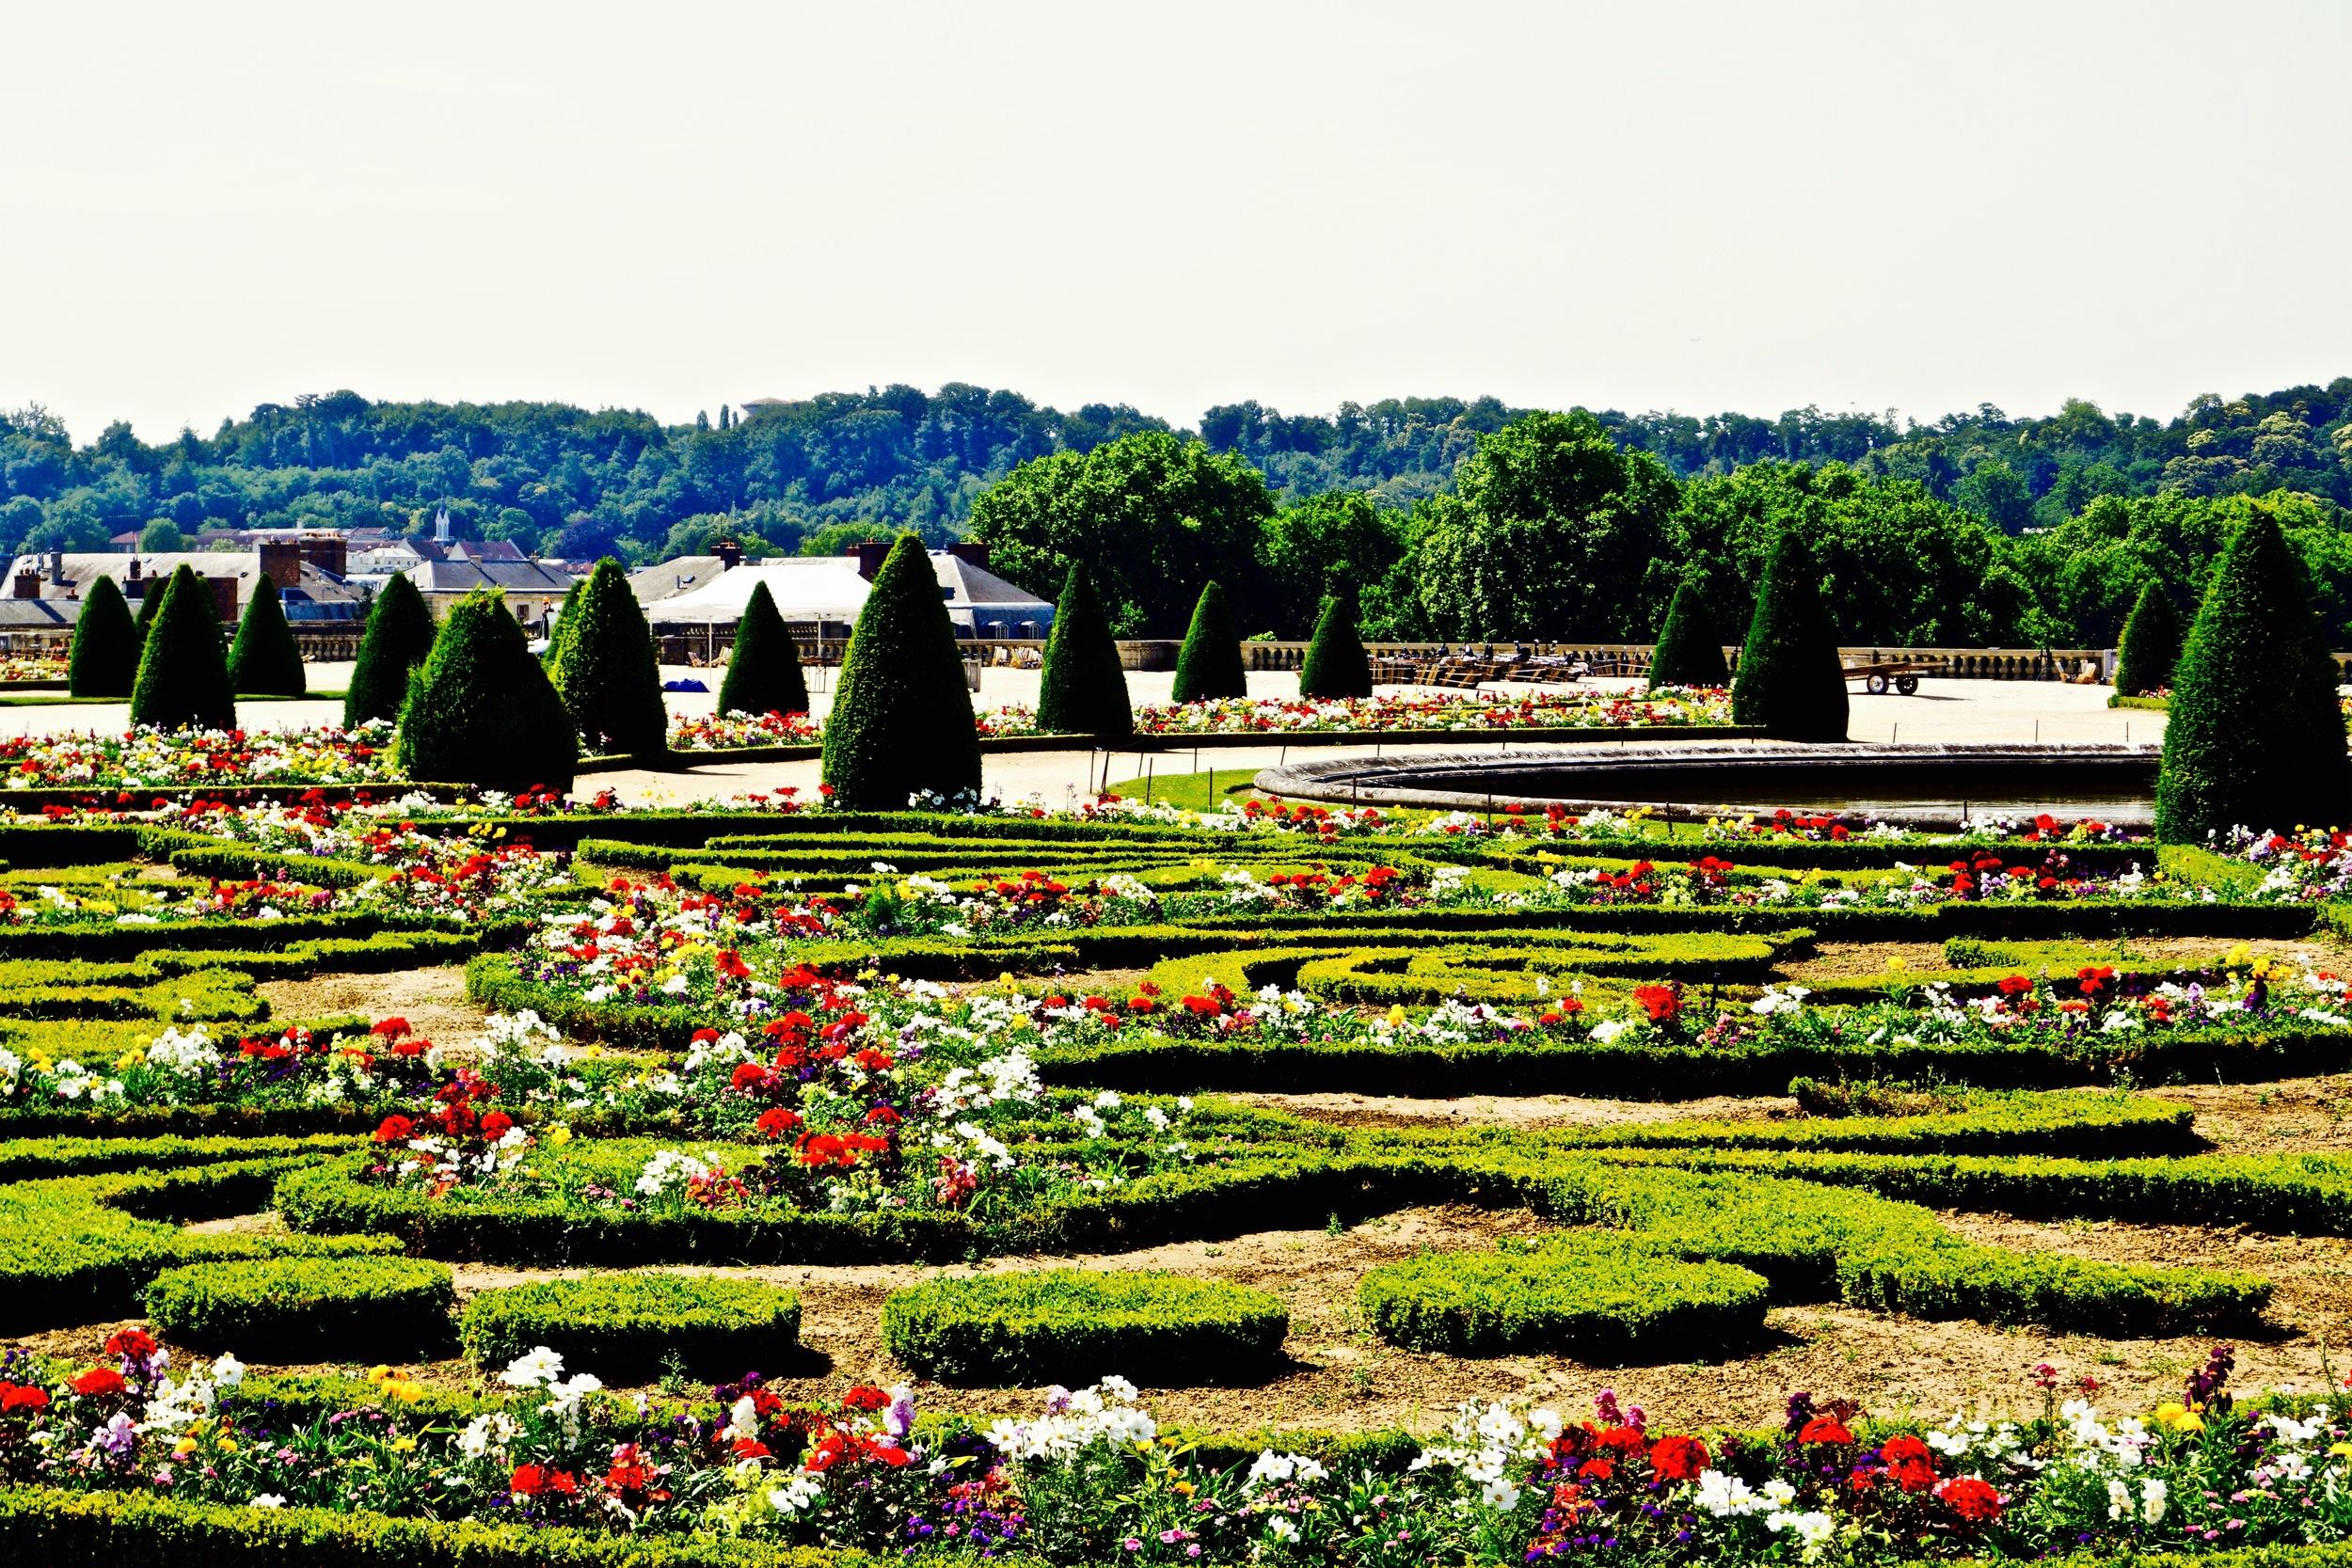 Versailles, France, June 2015